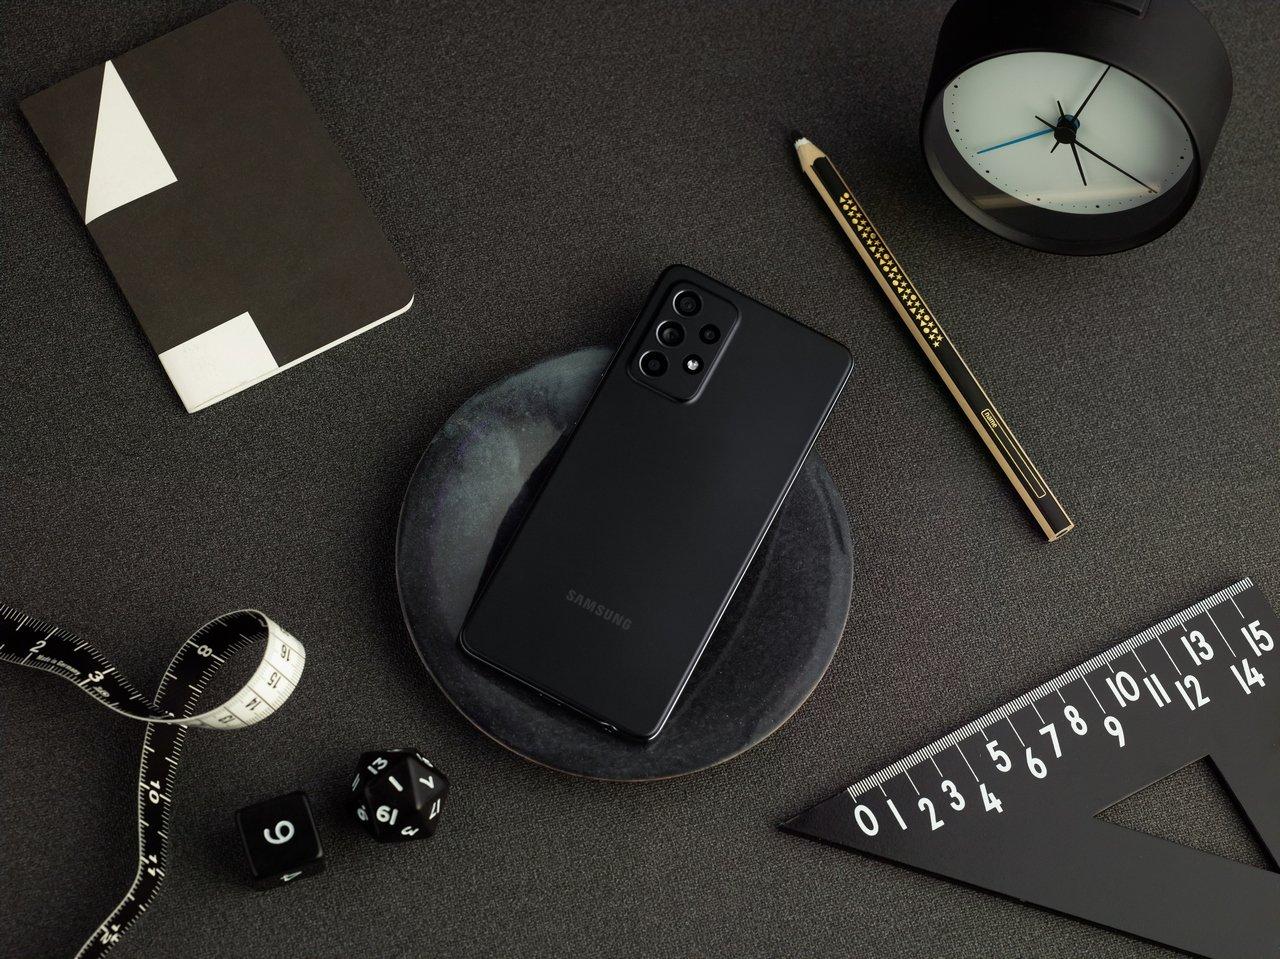 Galaxy_A52_lifestyle_black.jpg.954bcc3fe986b7e5aacf1ae9382985d5.jpg